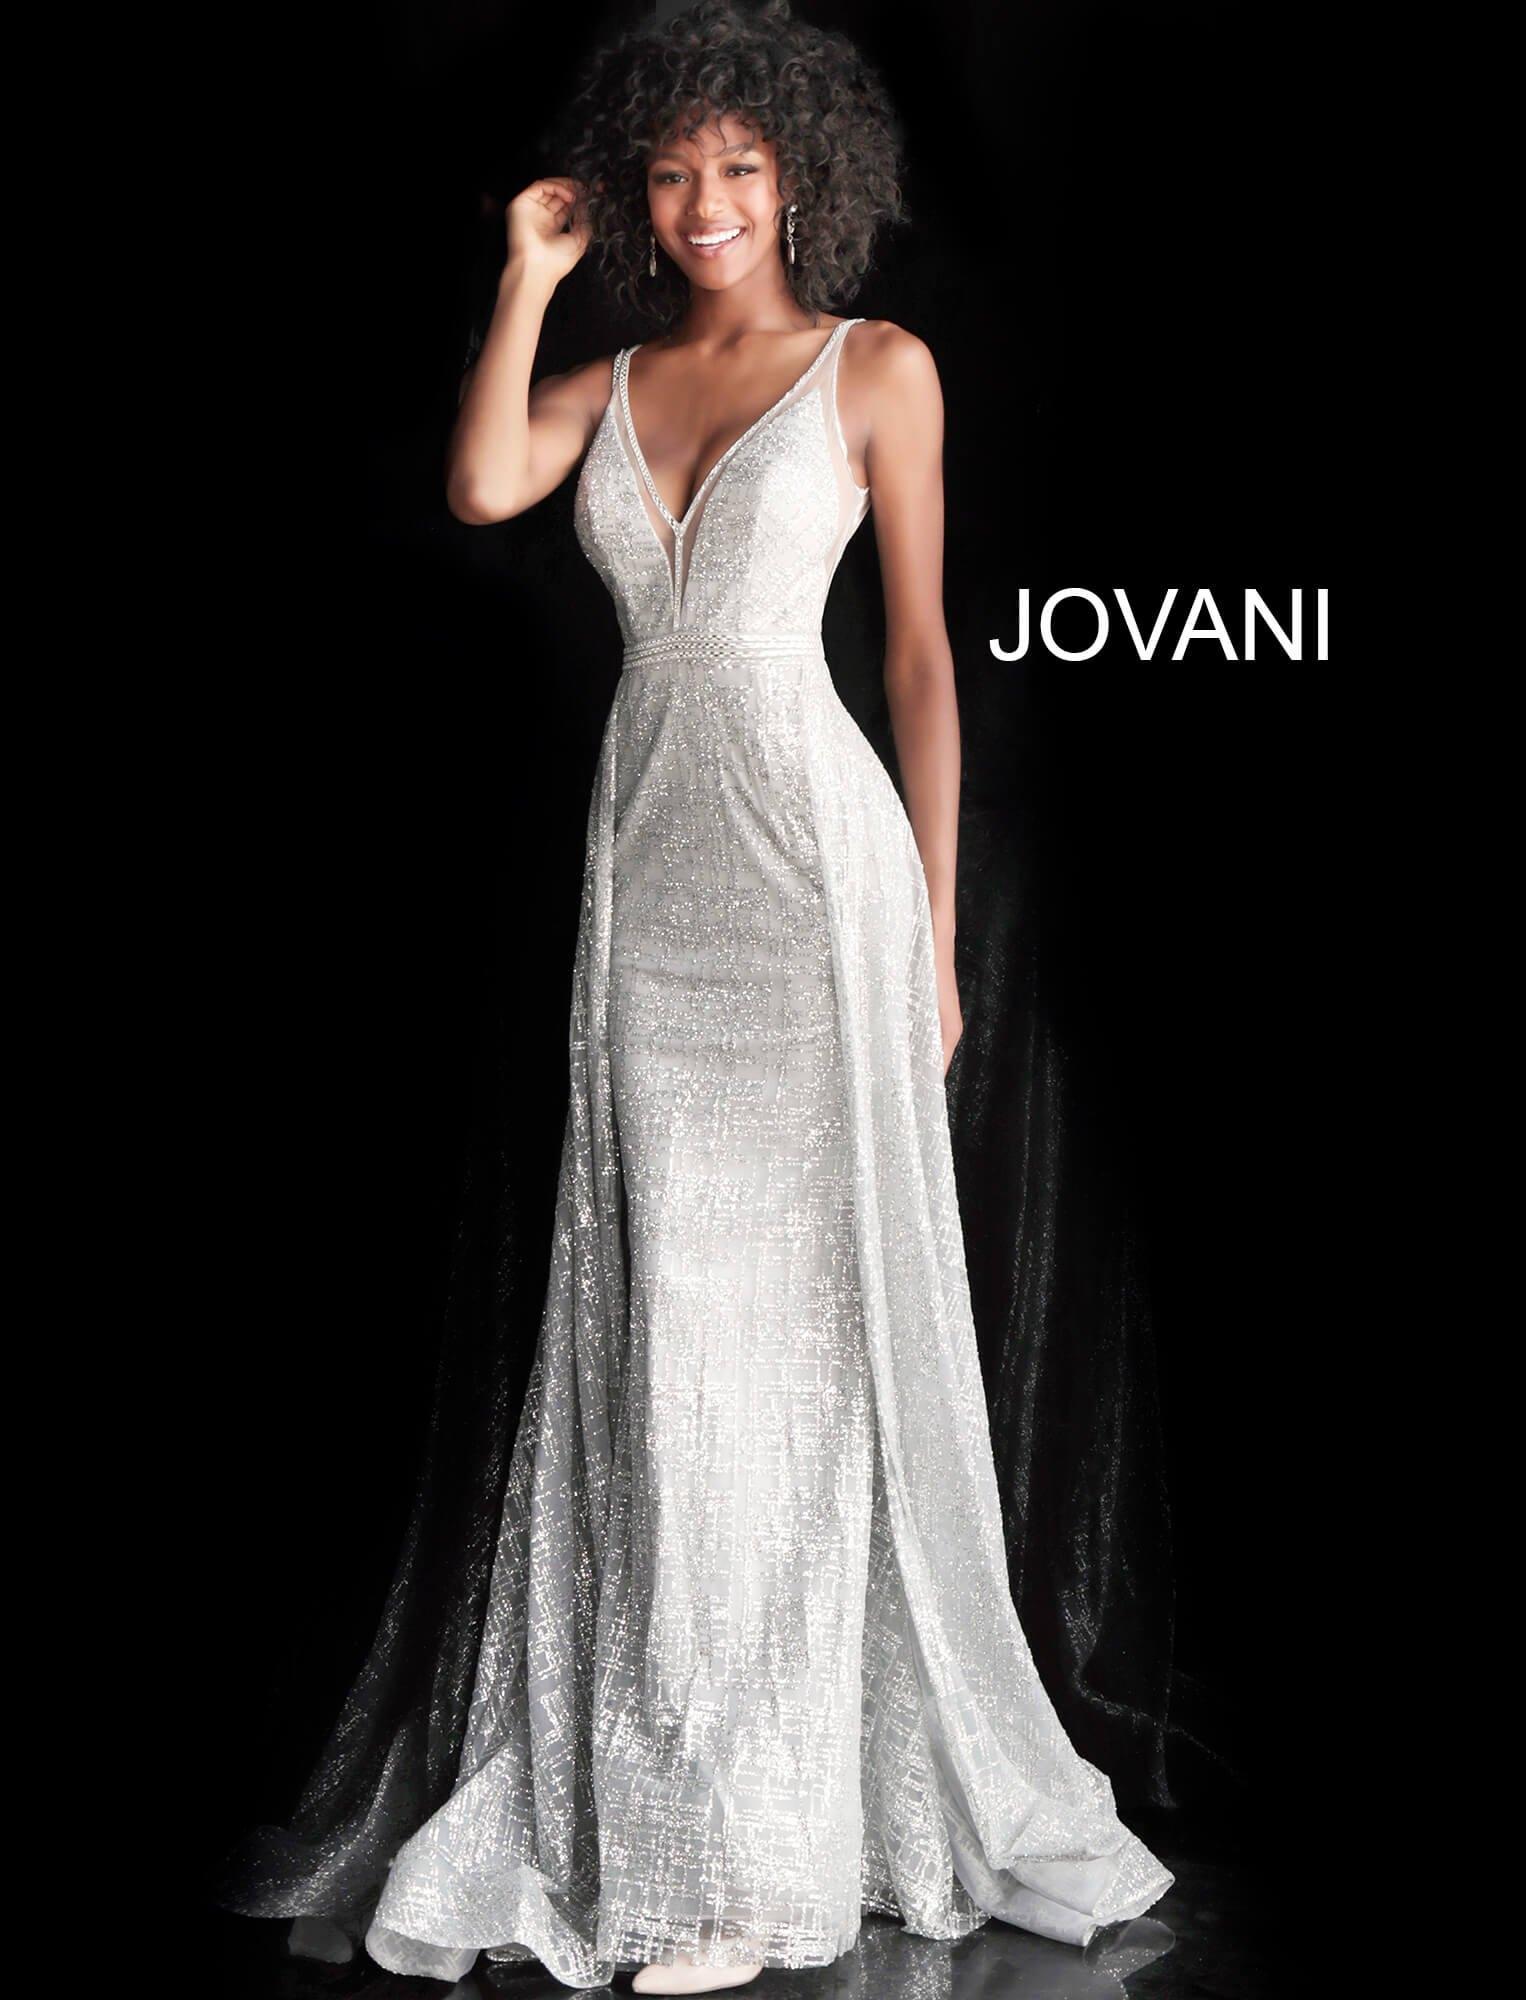 1193a6aeba2 Jovani 62515 - Glittery Deep V-Neck With Cape Prom Dress